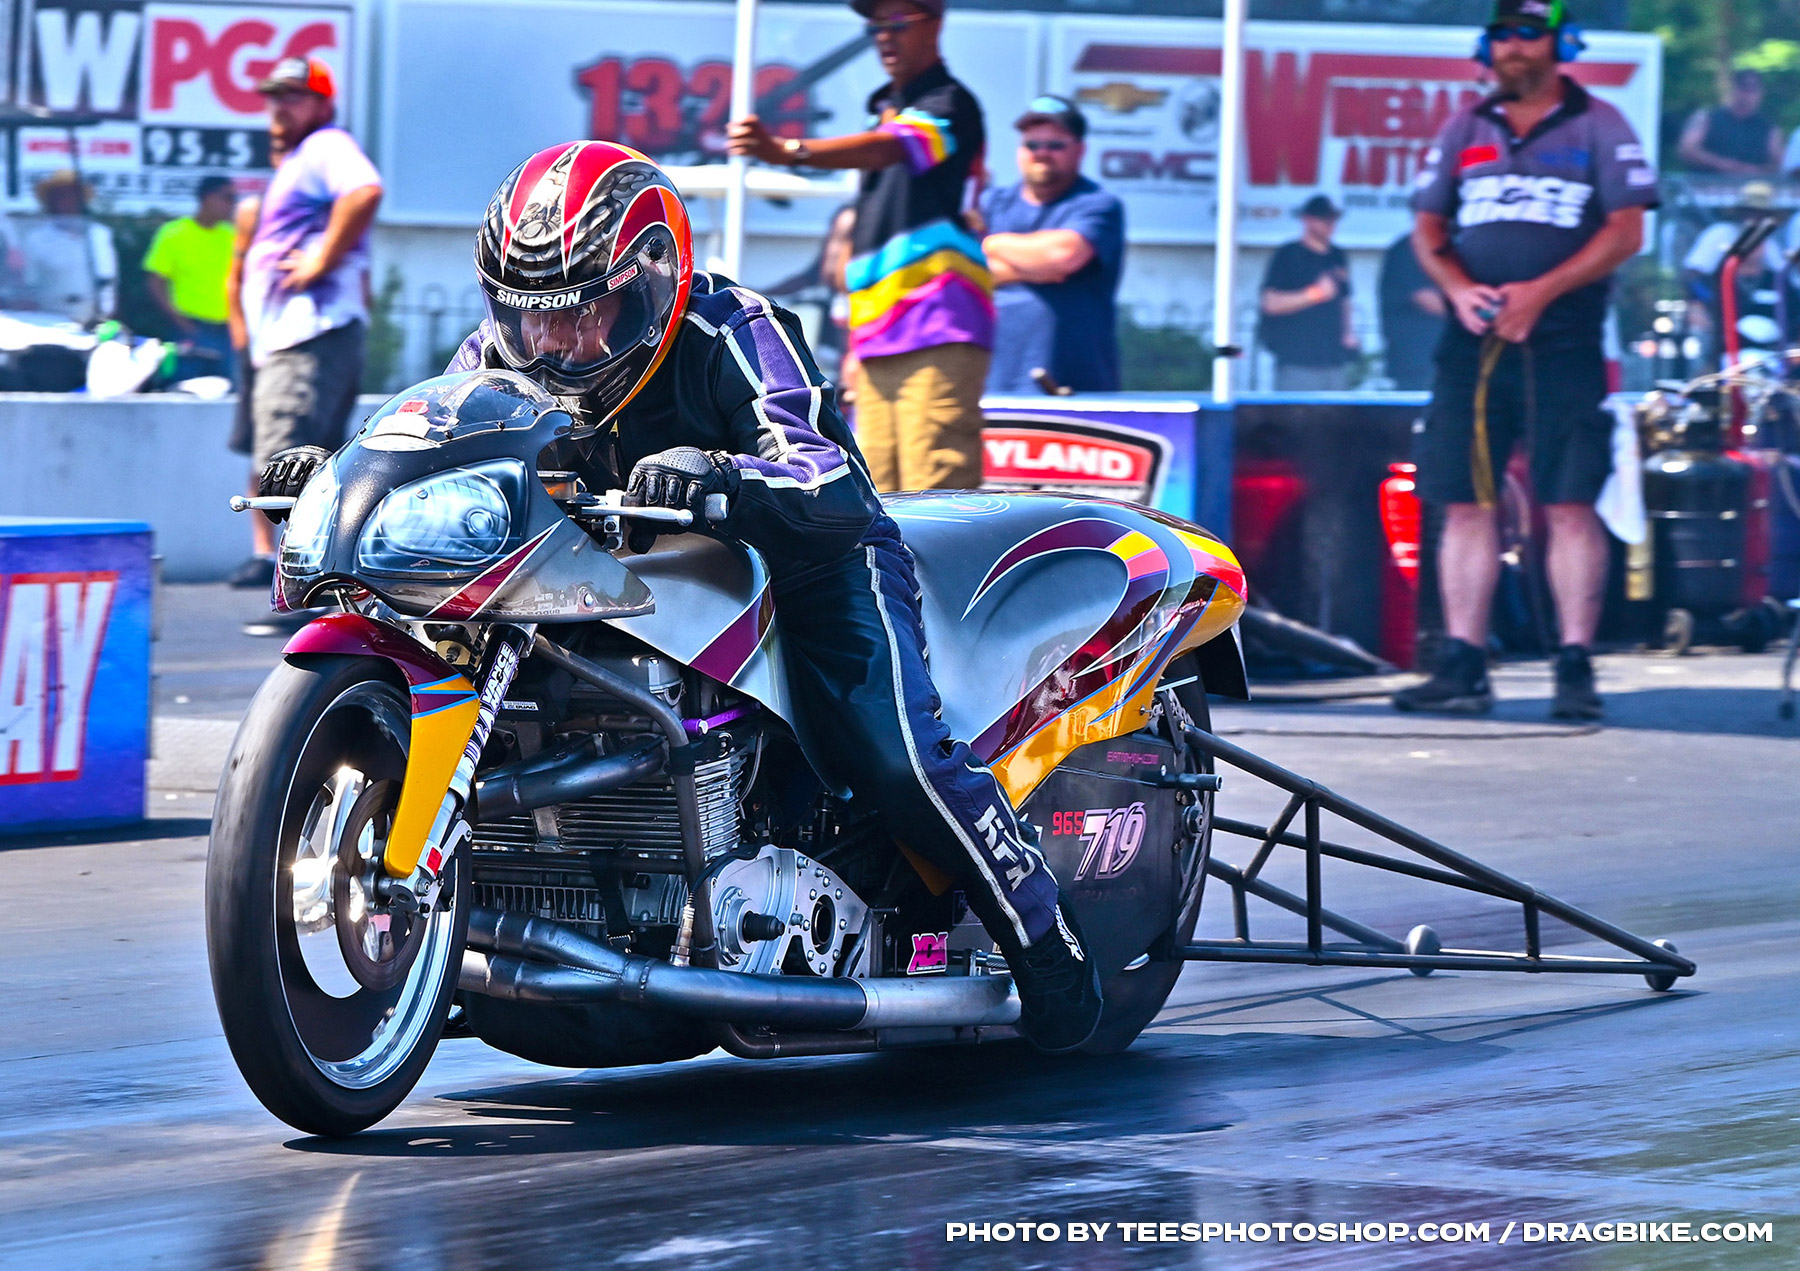 Frank Christian - XDA Motorcycle Drag Racers Finally Unleash for Battle